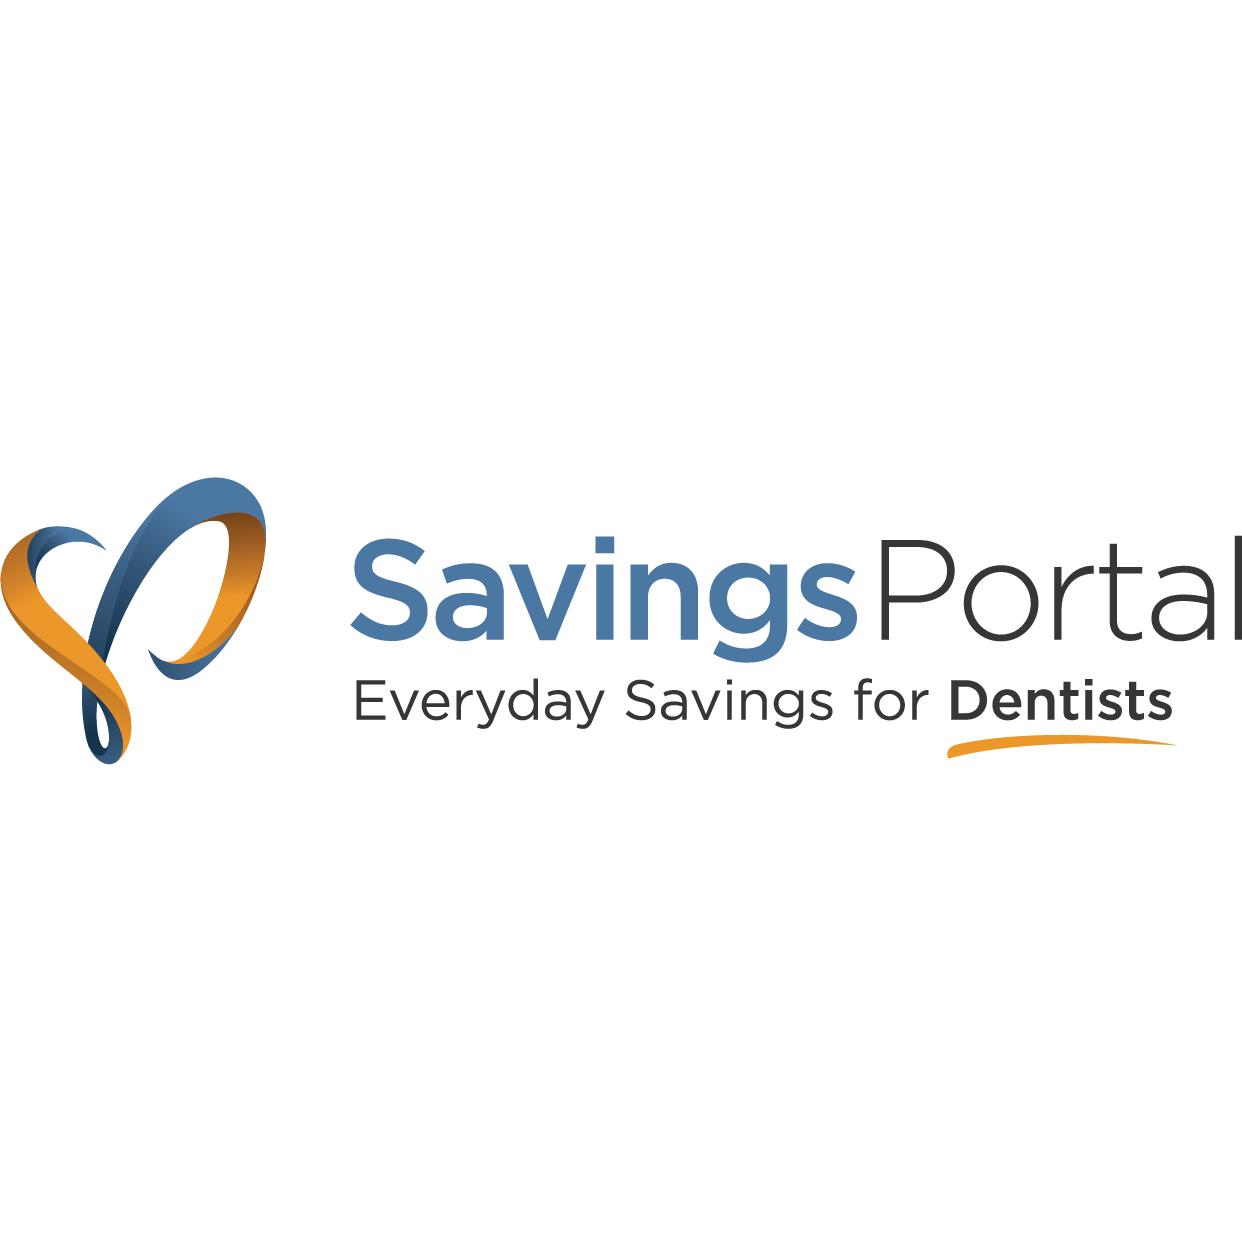 Savings Portal